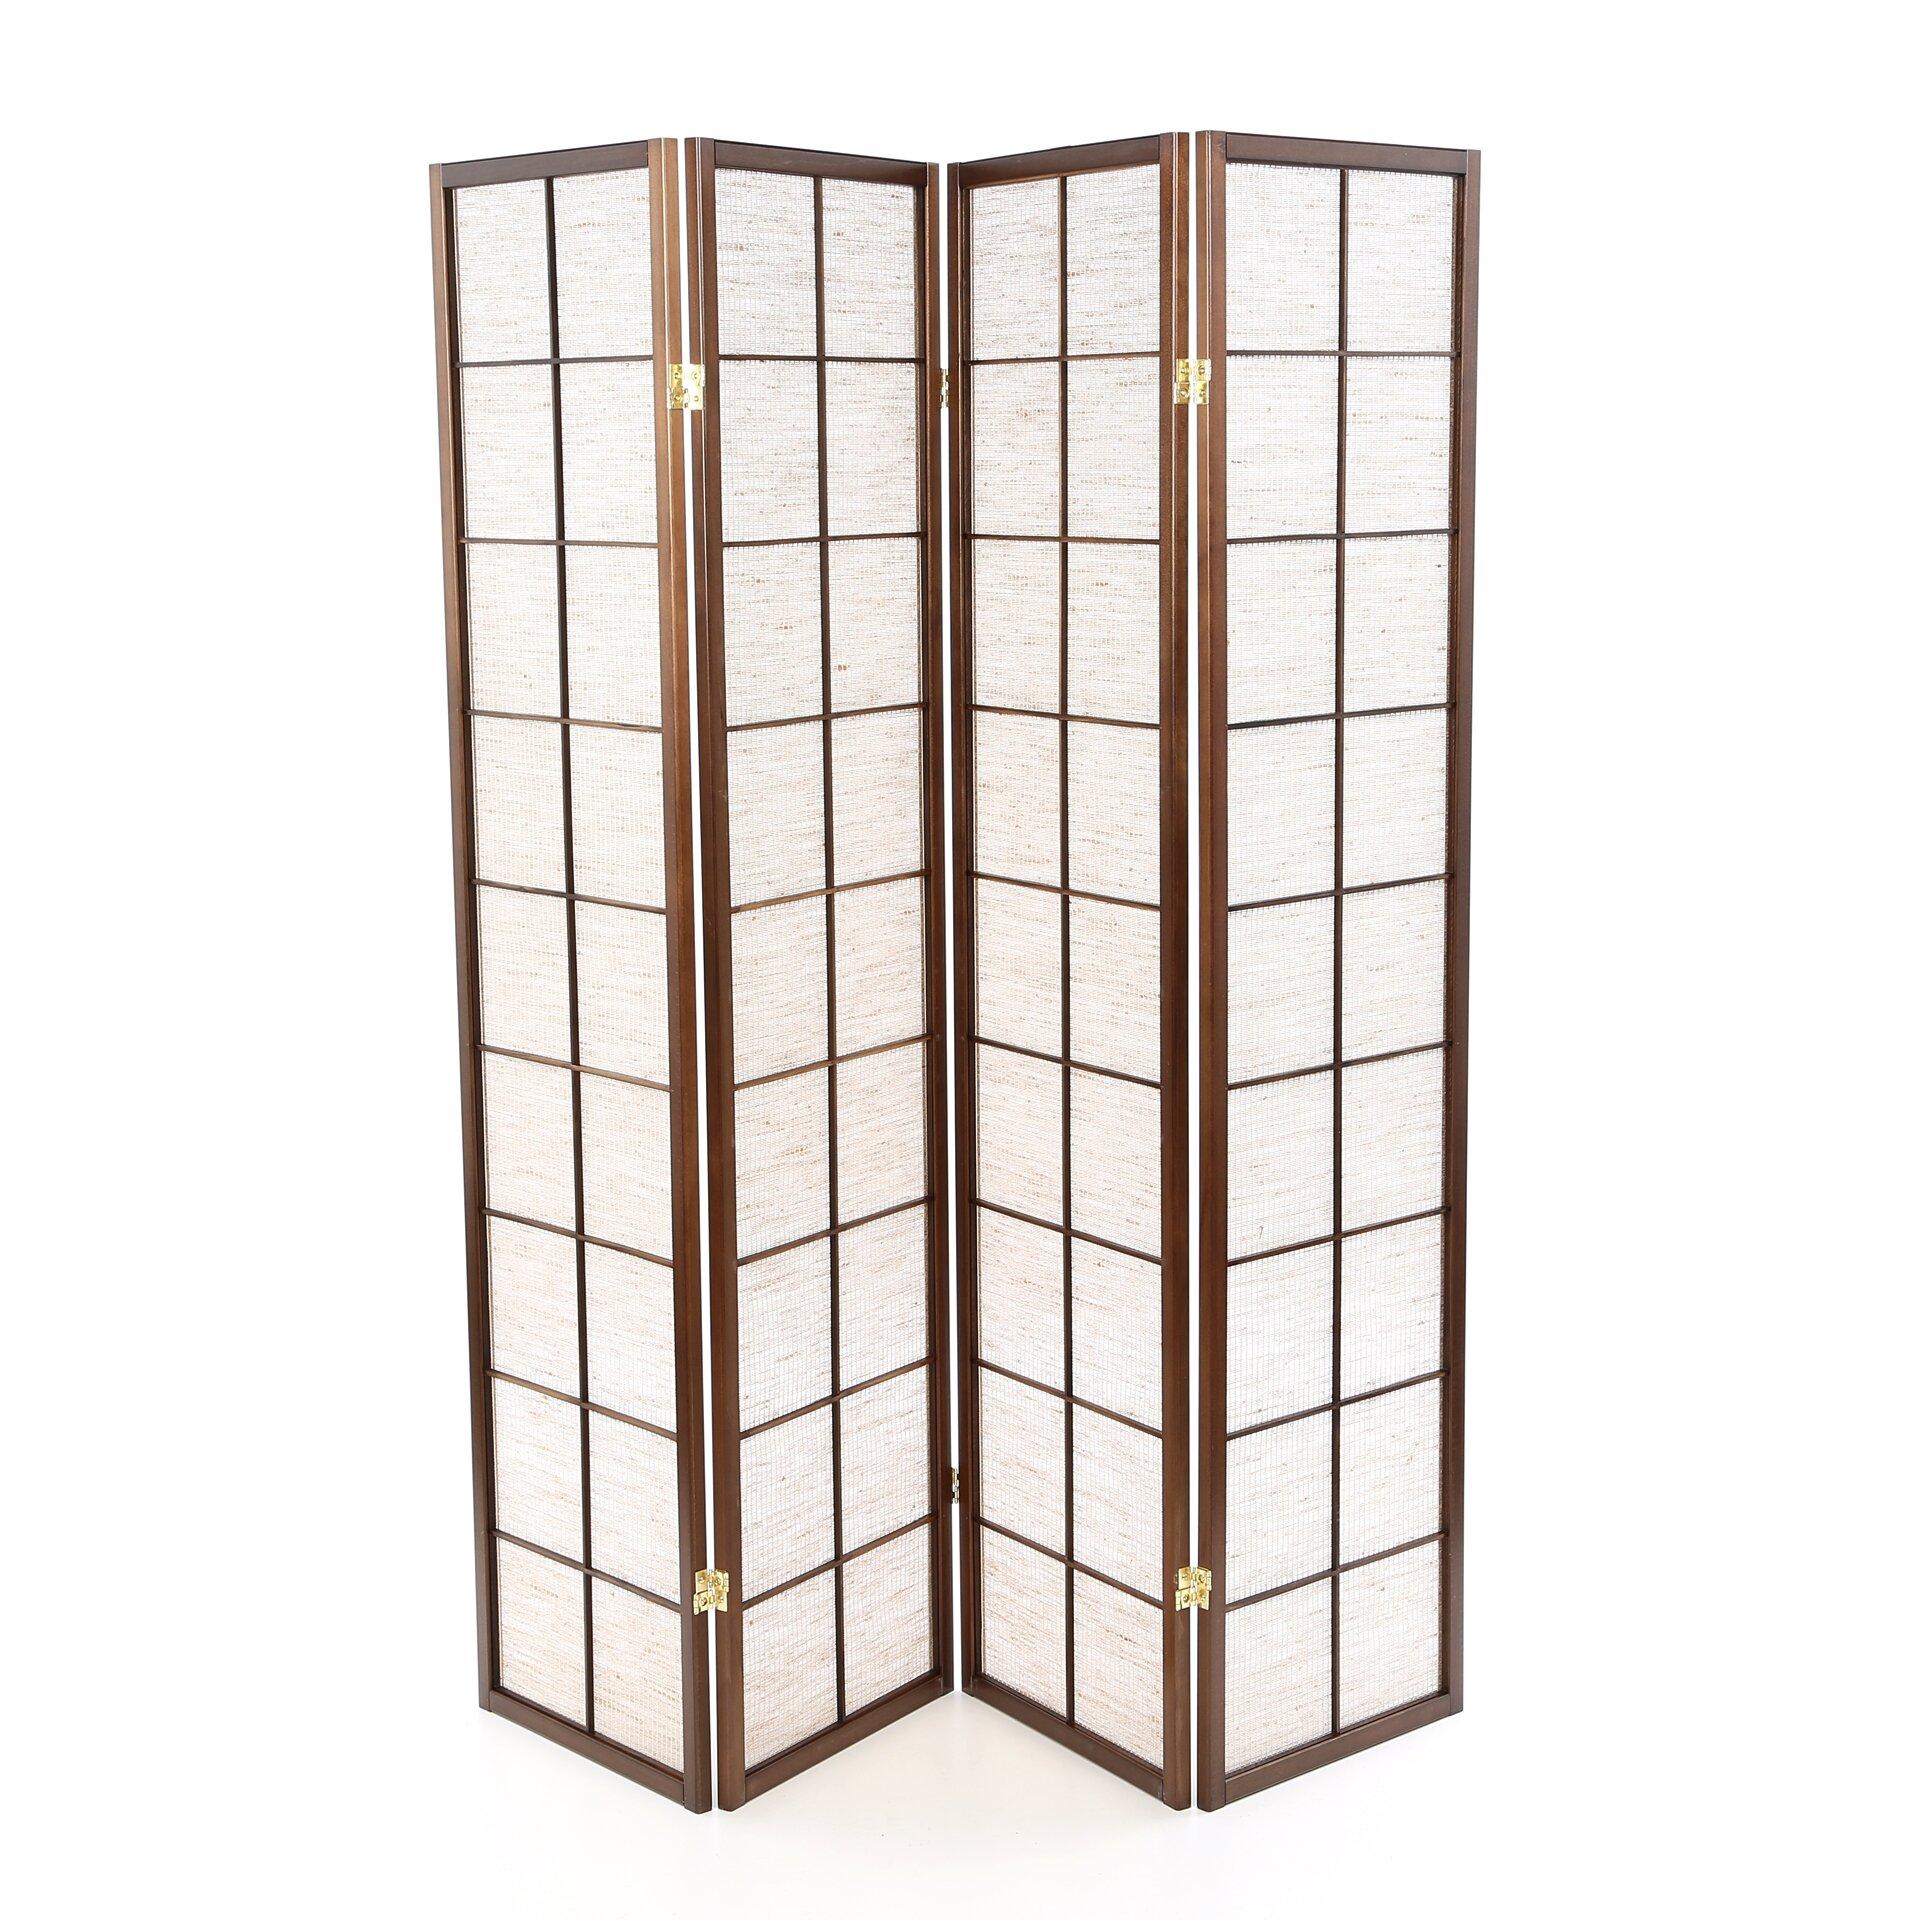 Wildon home 70 x 68 shoji 4 panel room divider reviews wayfair - Shoji room divider ...